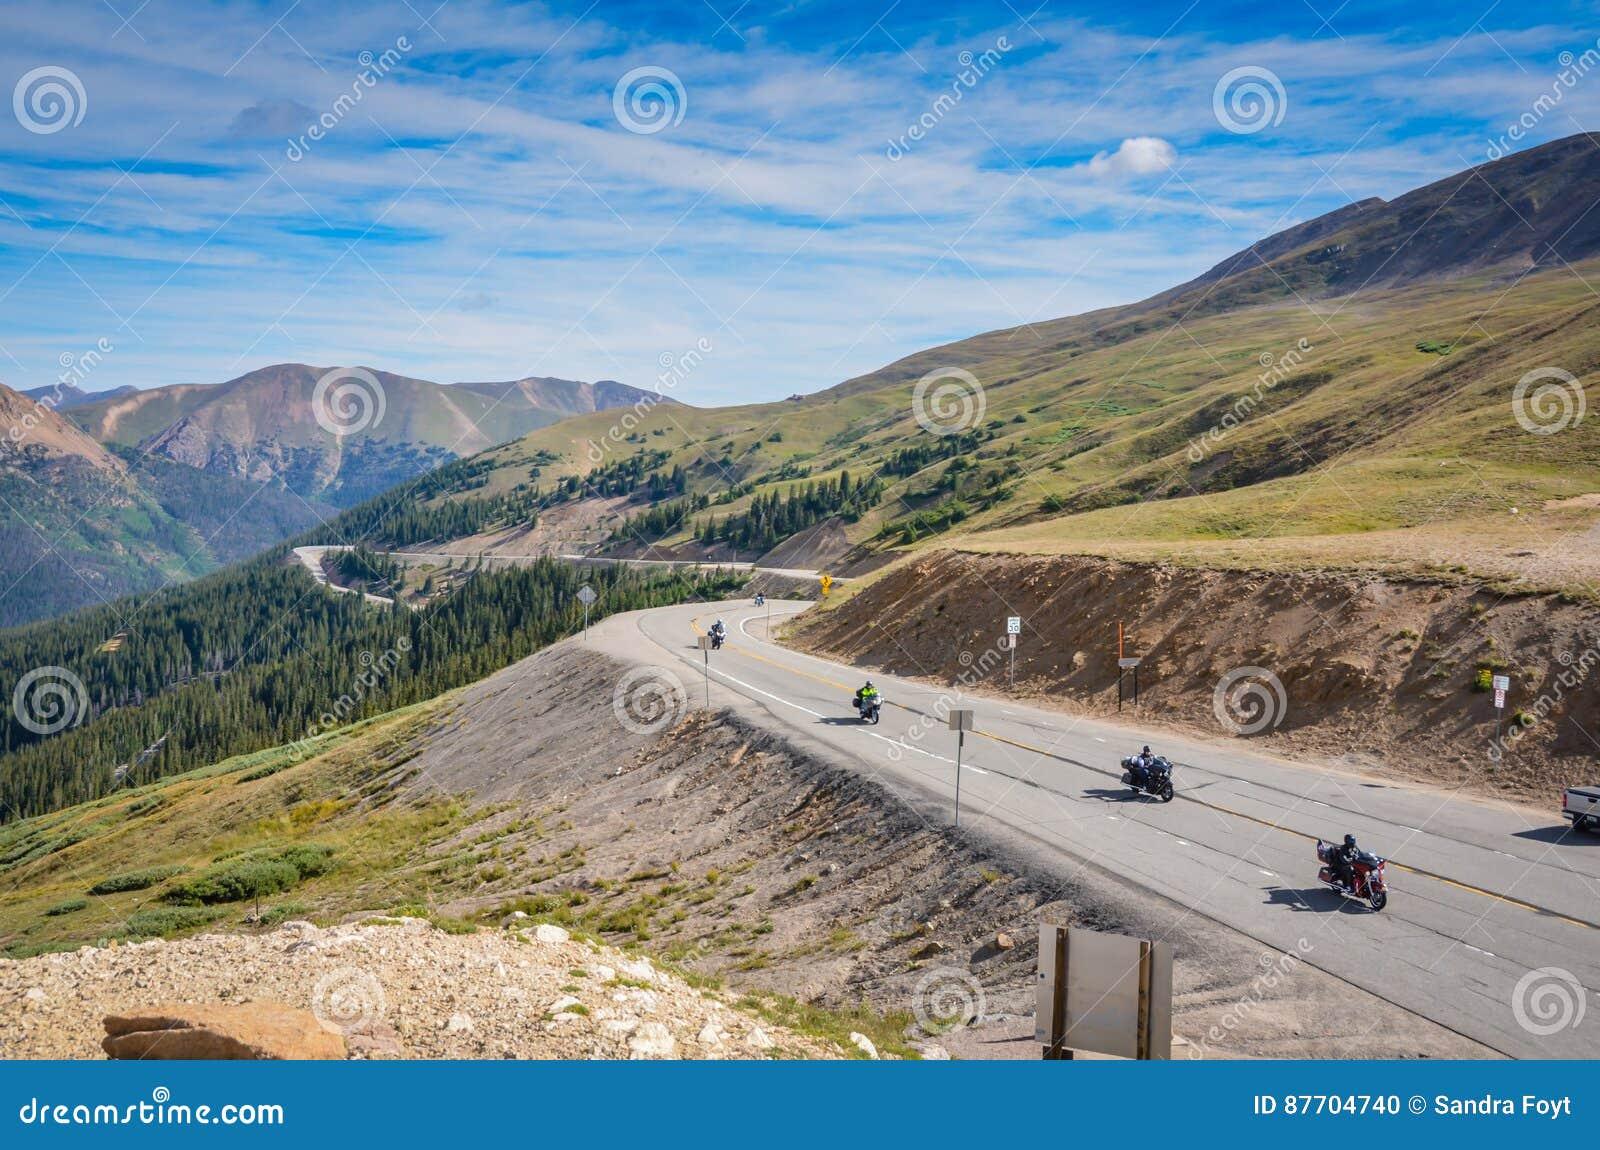 Passage de Motorcyles - de Loveland - le Colorado